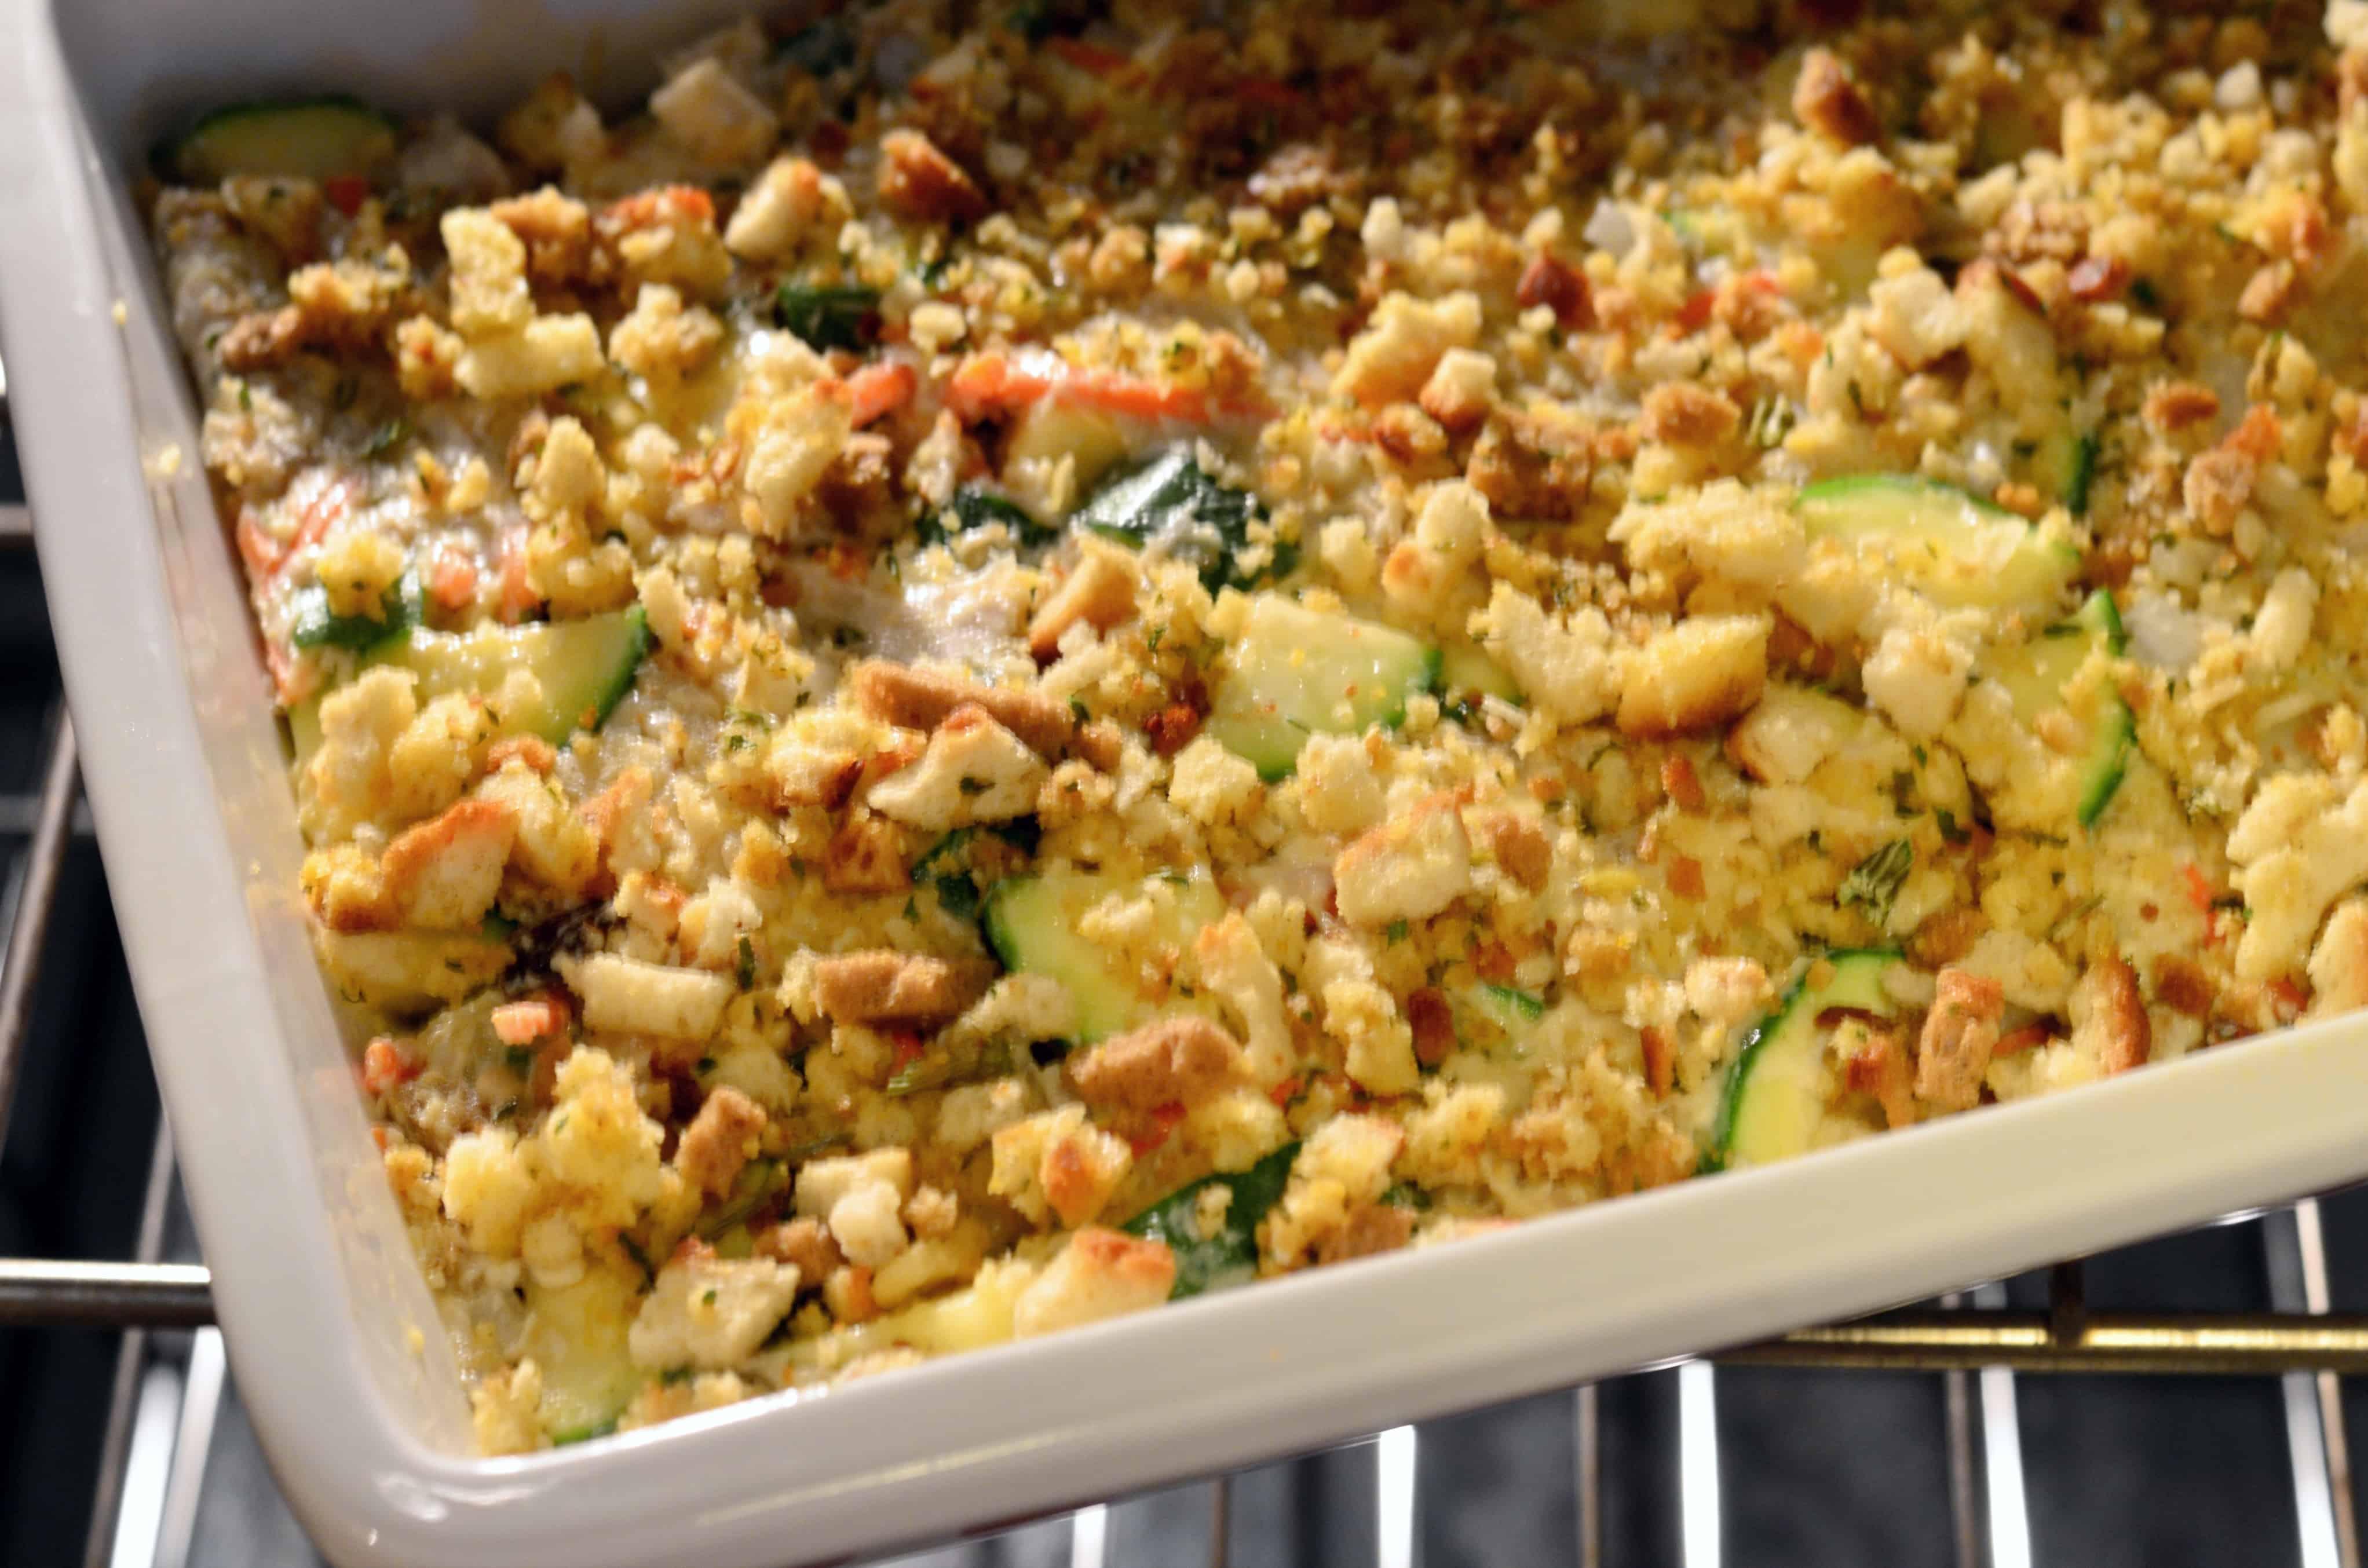 turkey casserole with stuffing